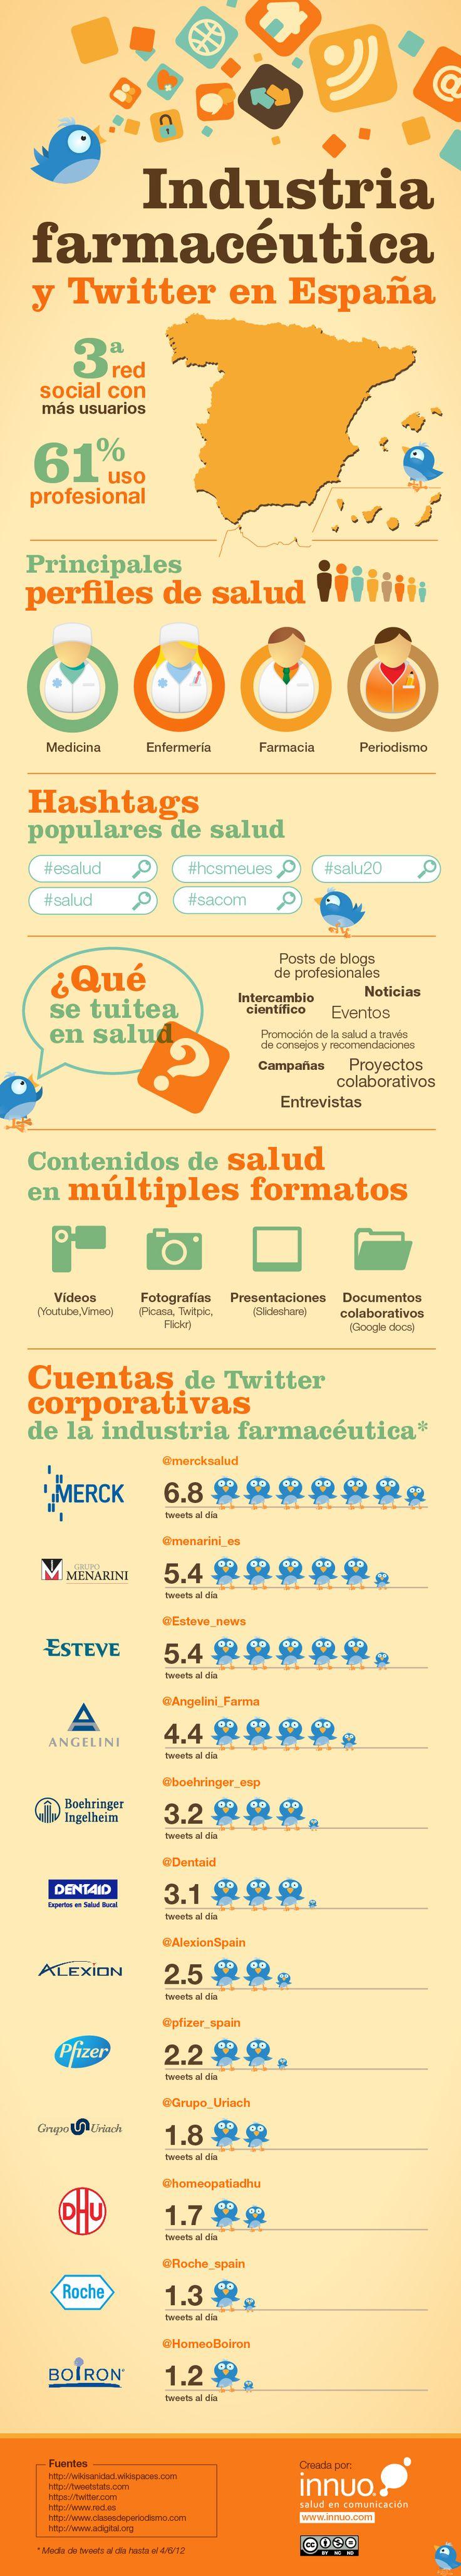 Pharma industry and Twitter in Spain - Industria farmacéutica y Twitter en Espa...